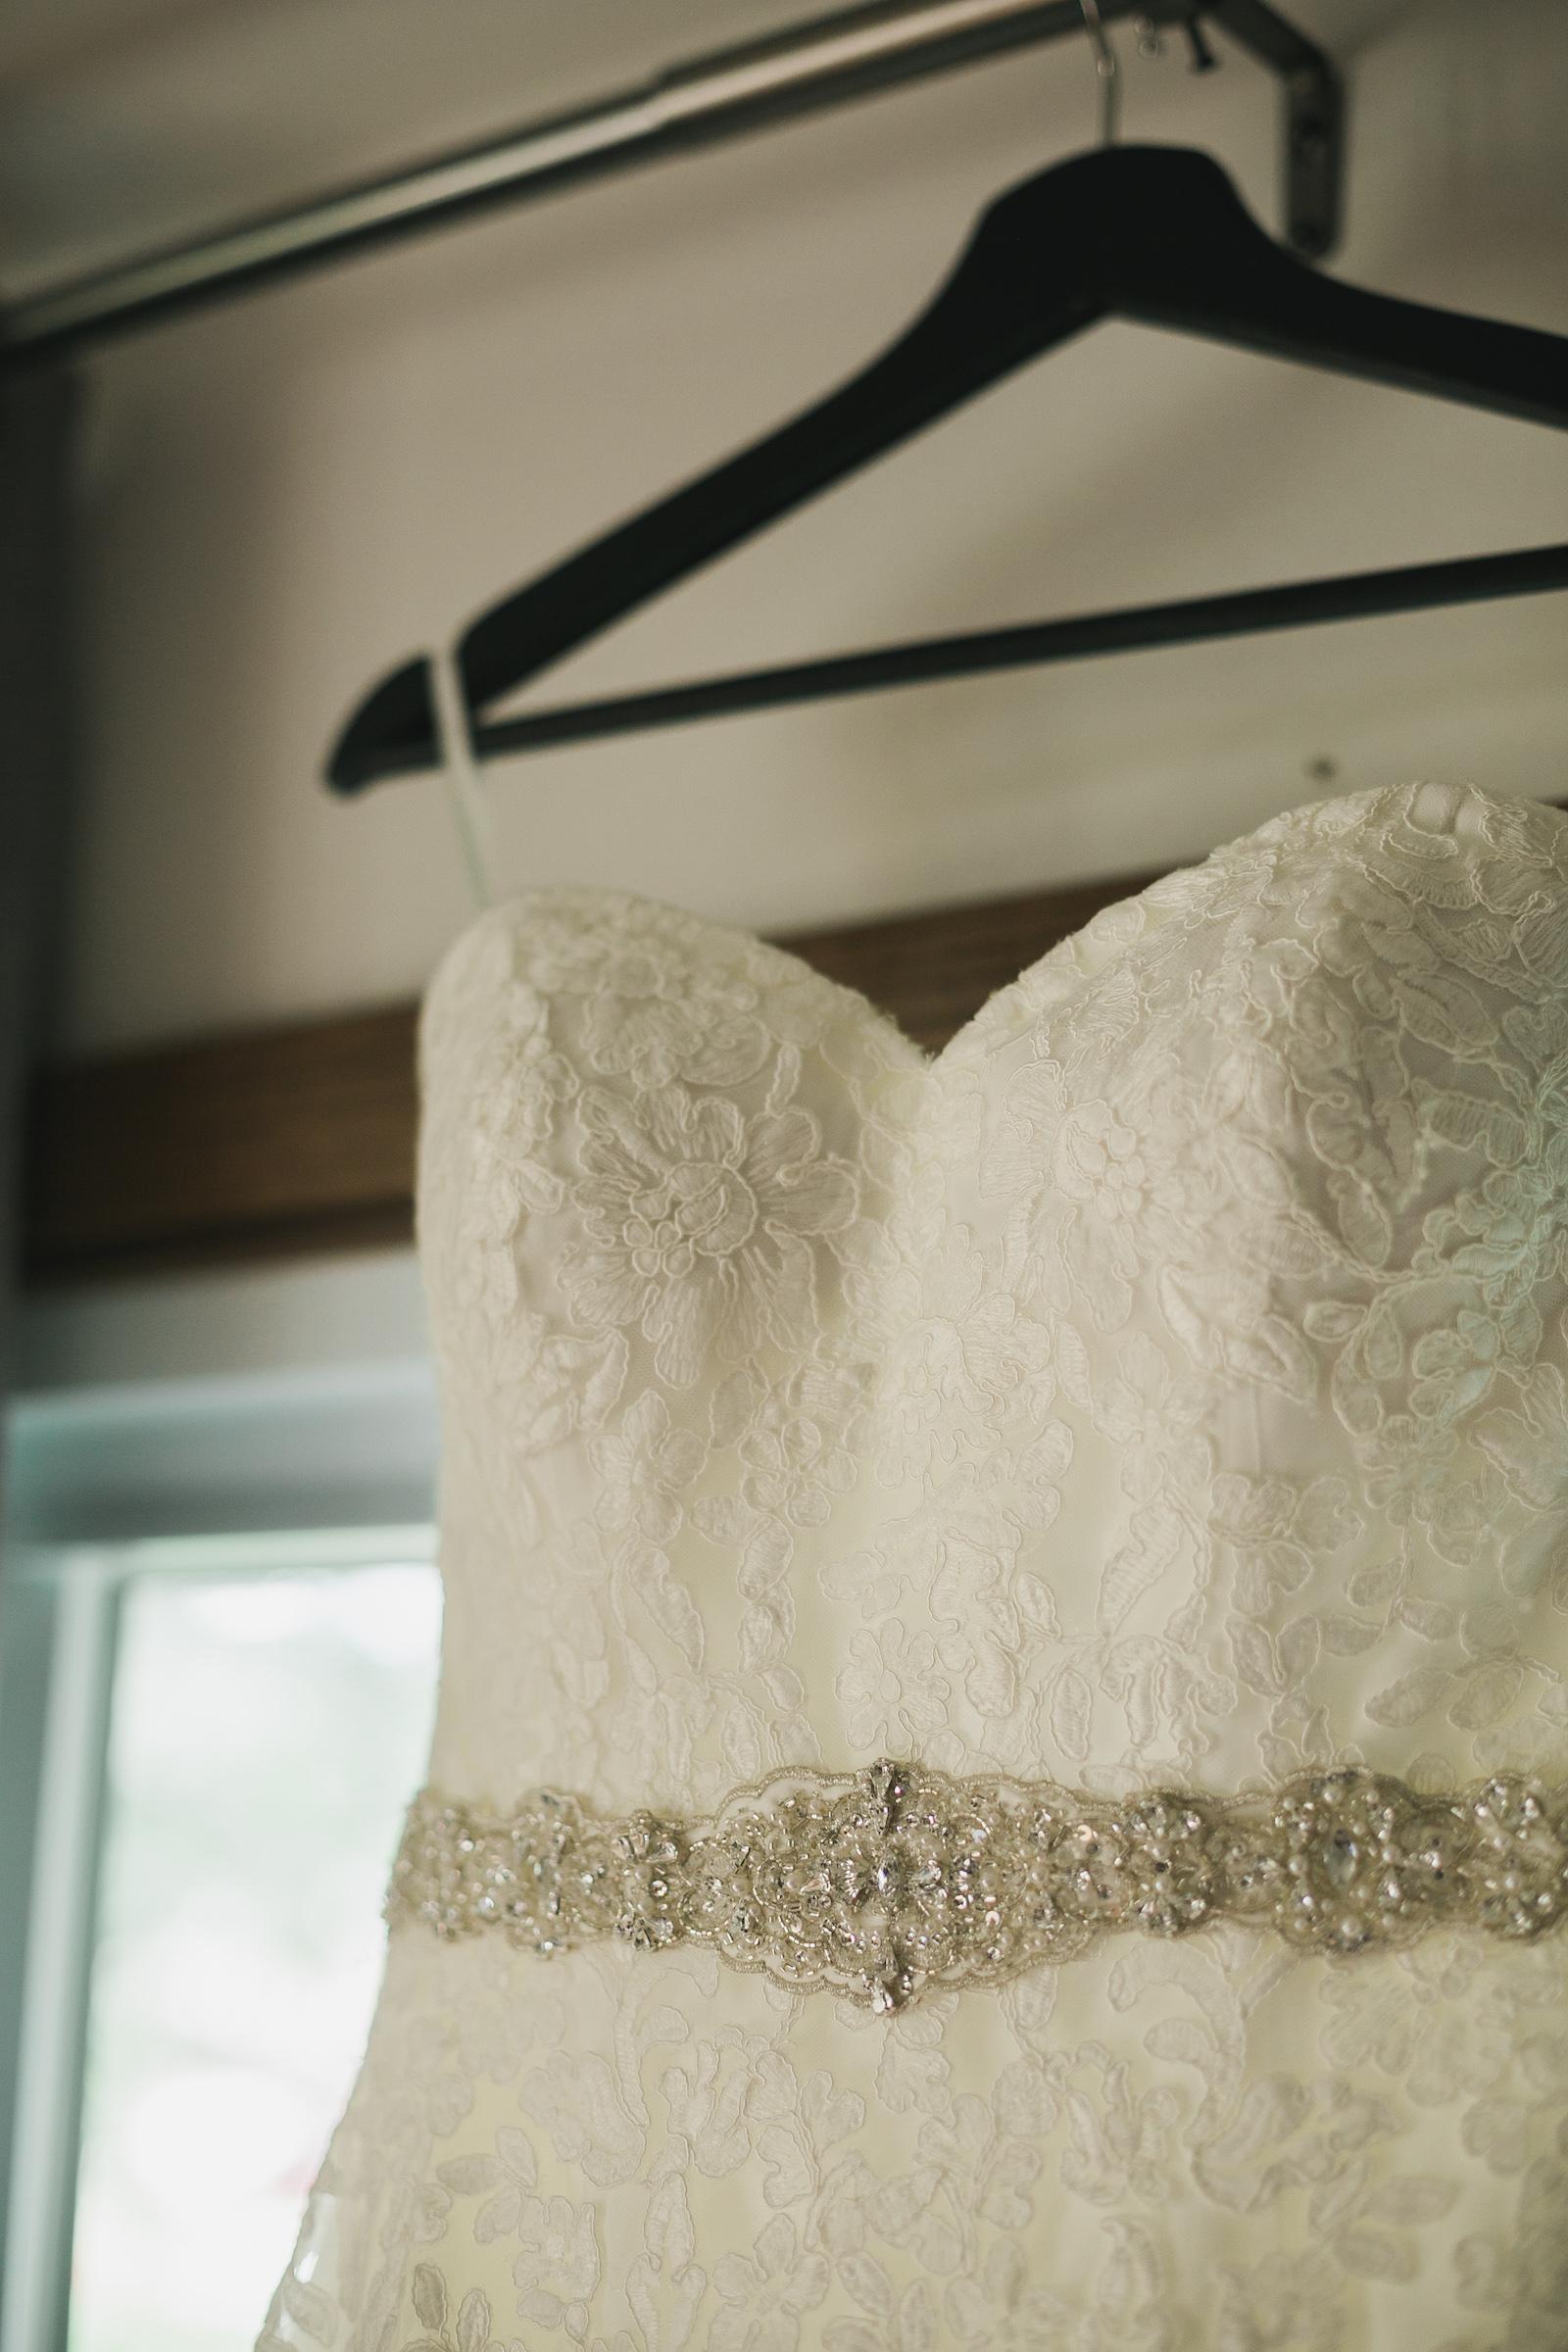 wisconsin-wedding-acowsay-uttke-photography-4.jpg